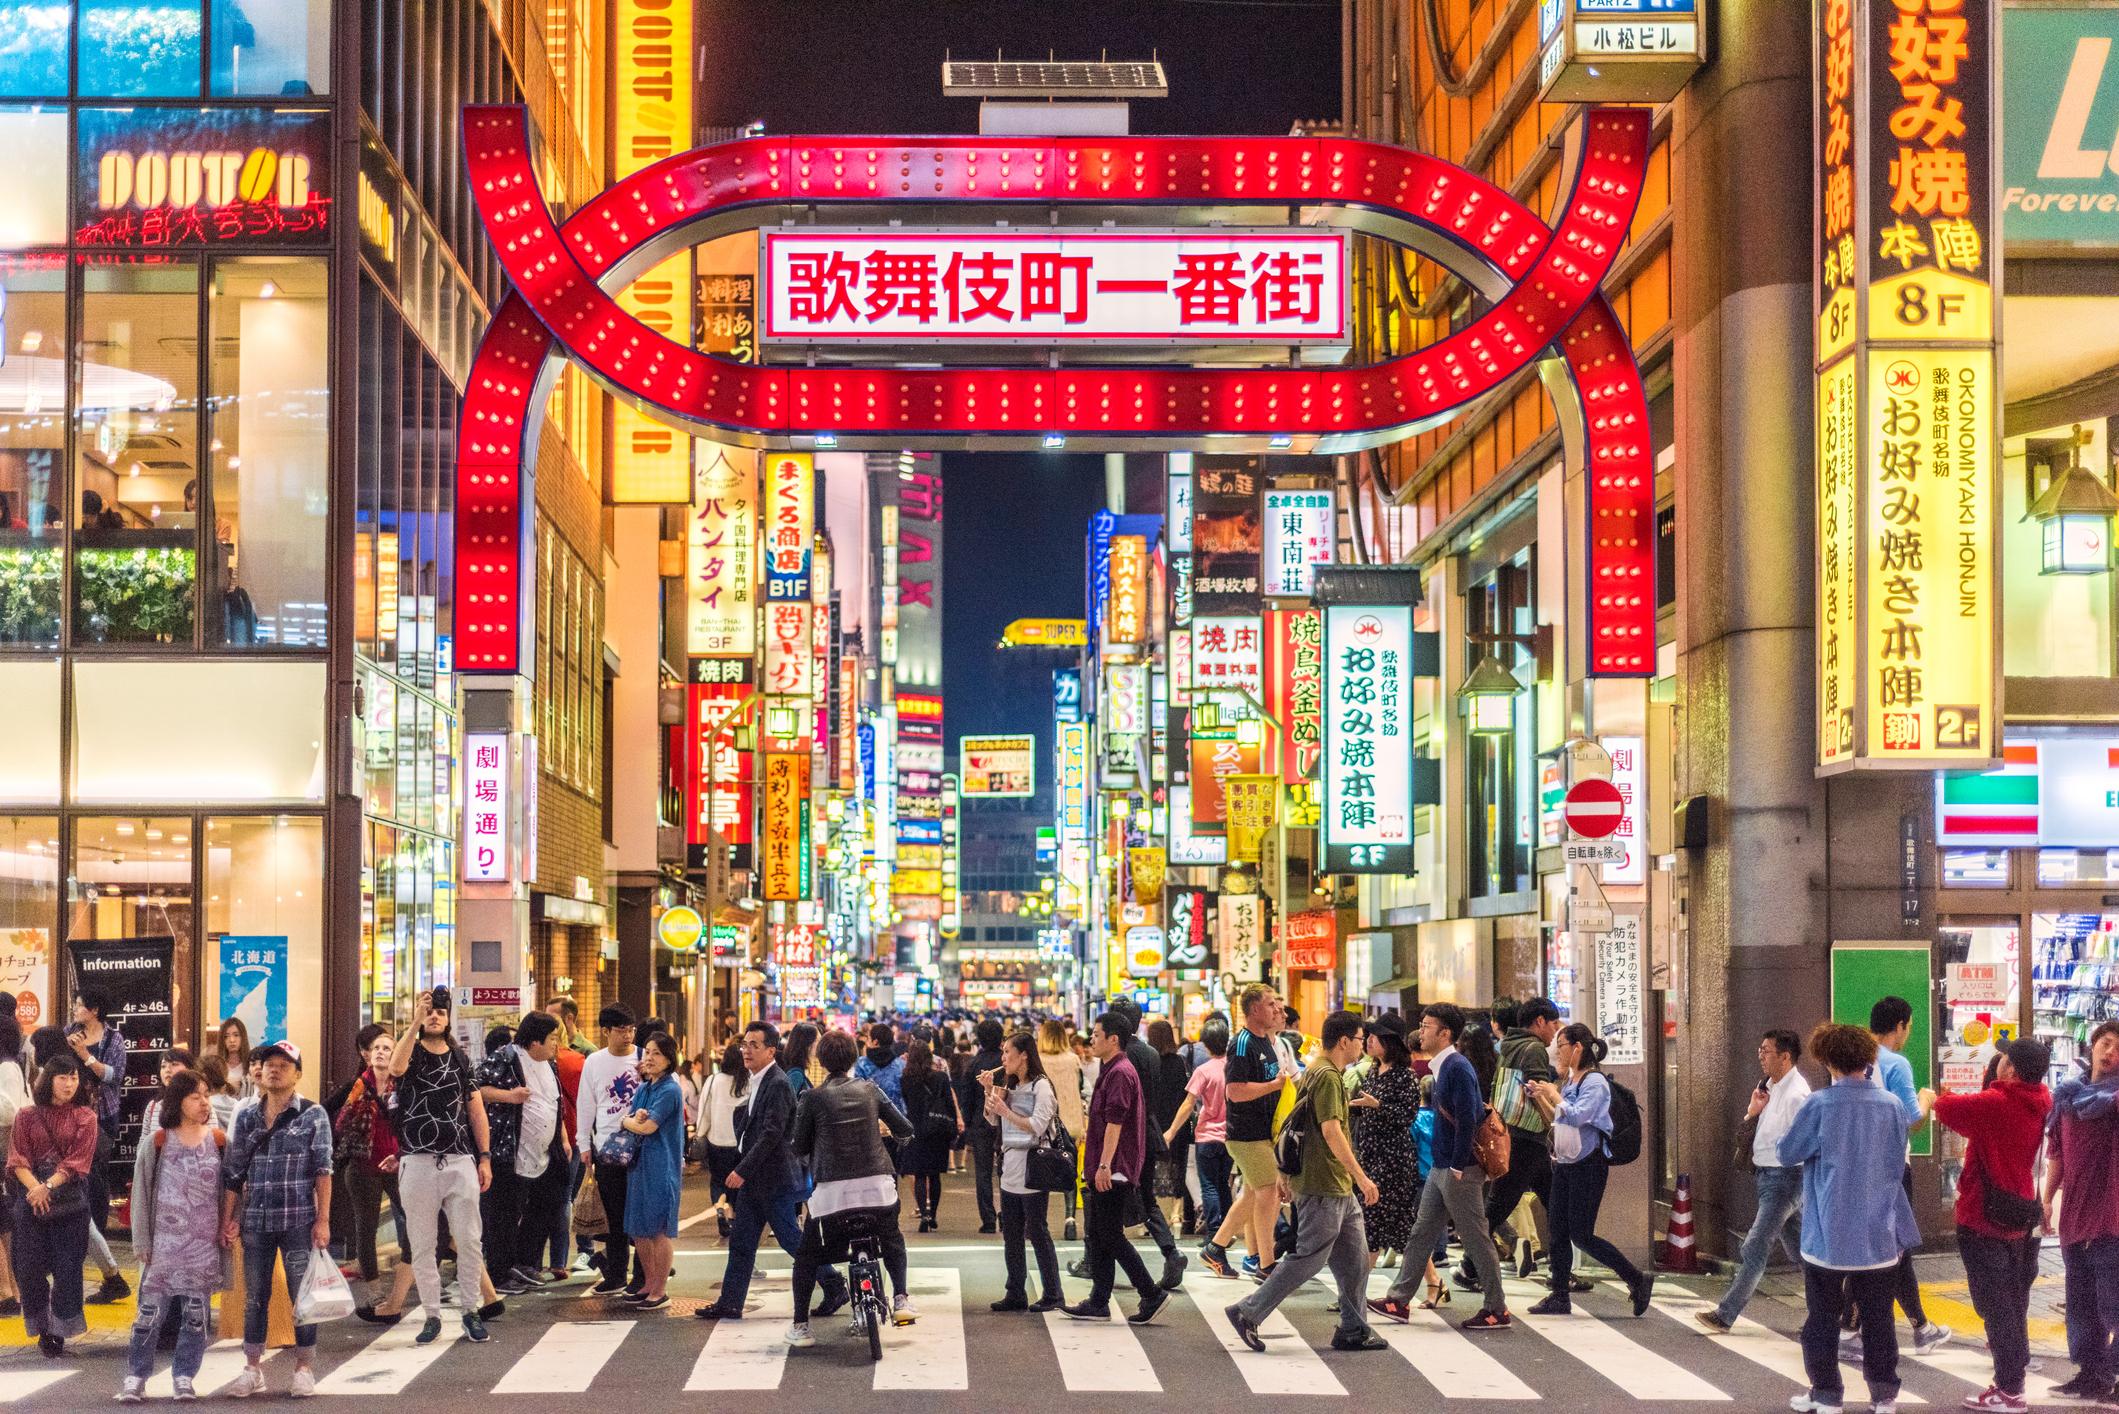 Distrik Merah Kabukicho Jepang